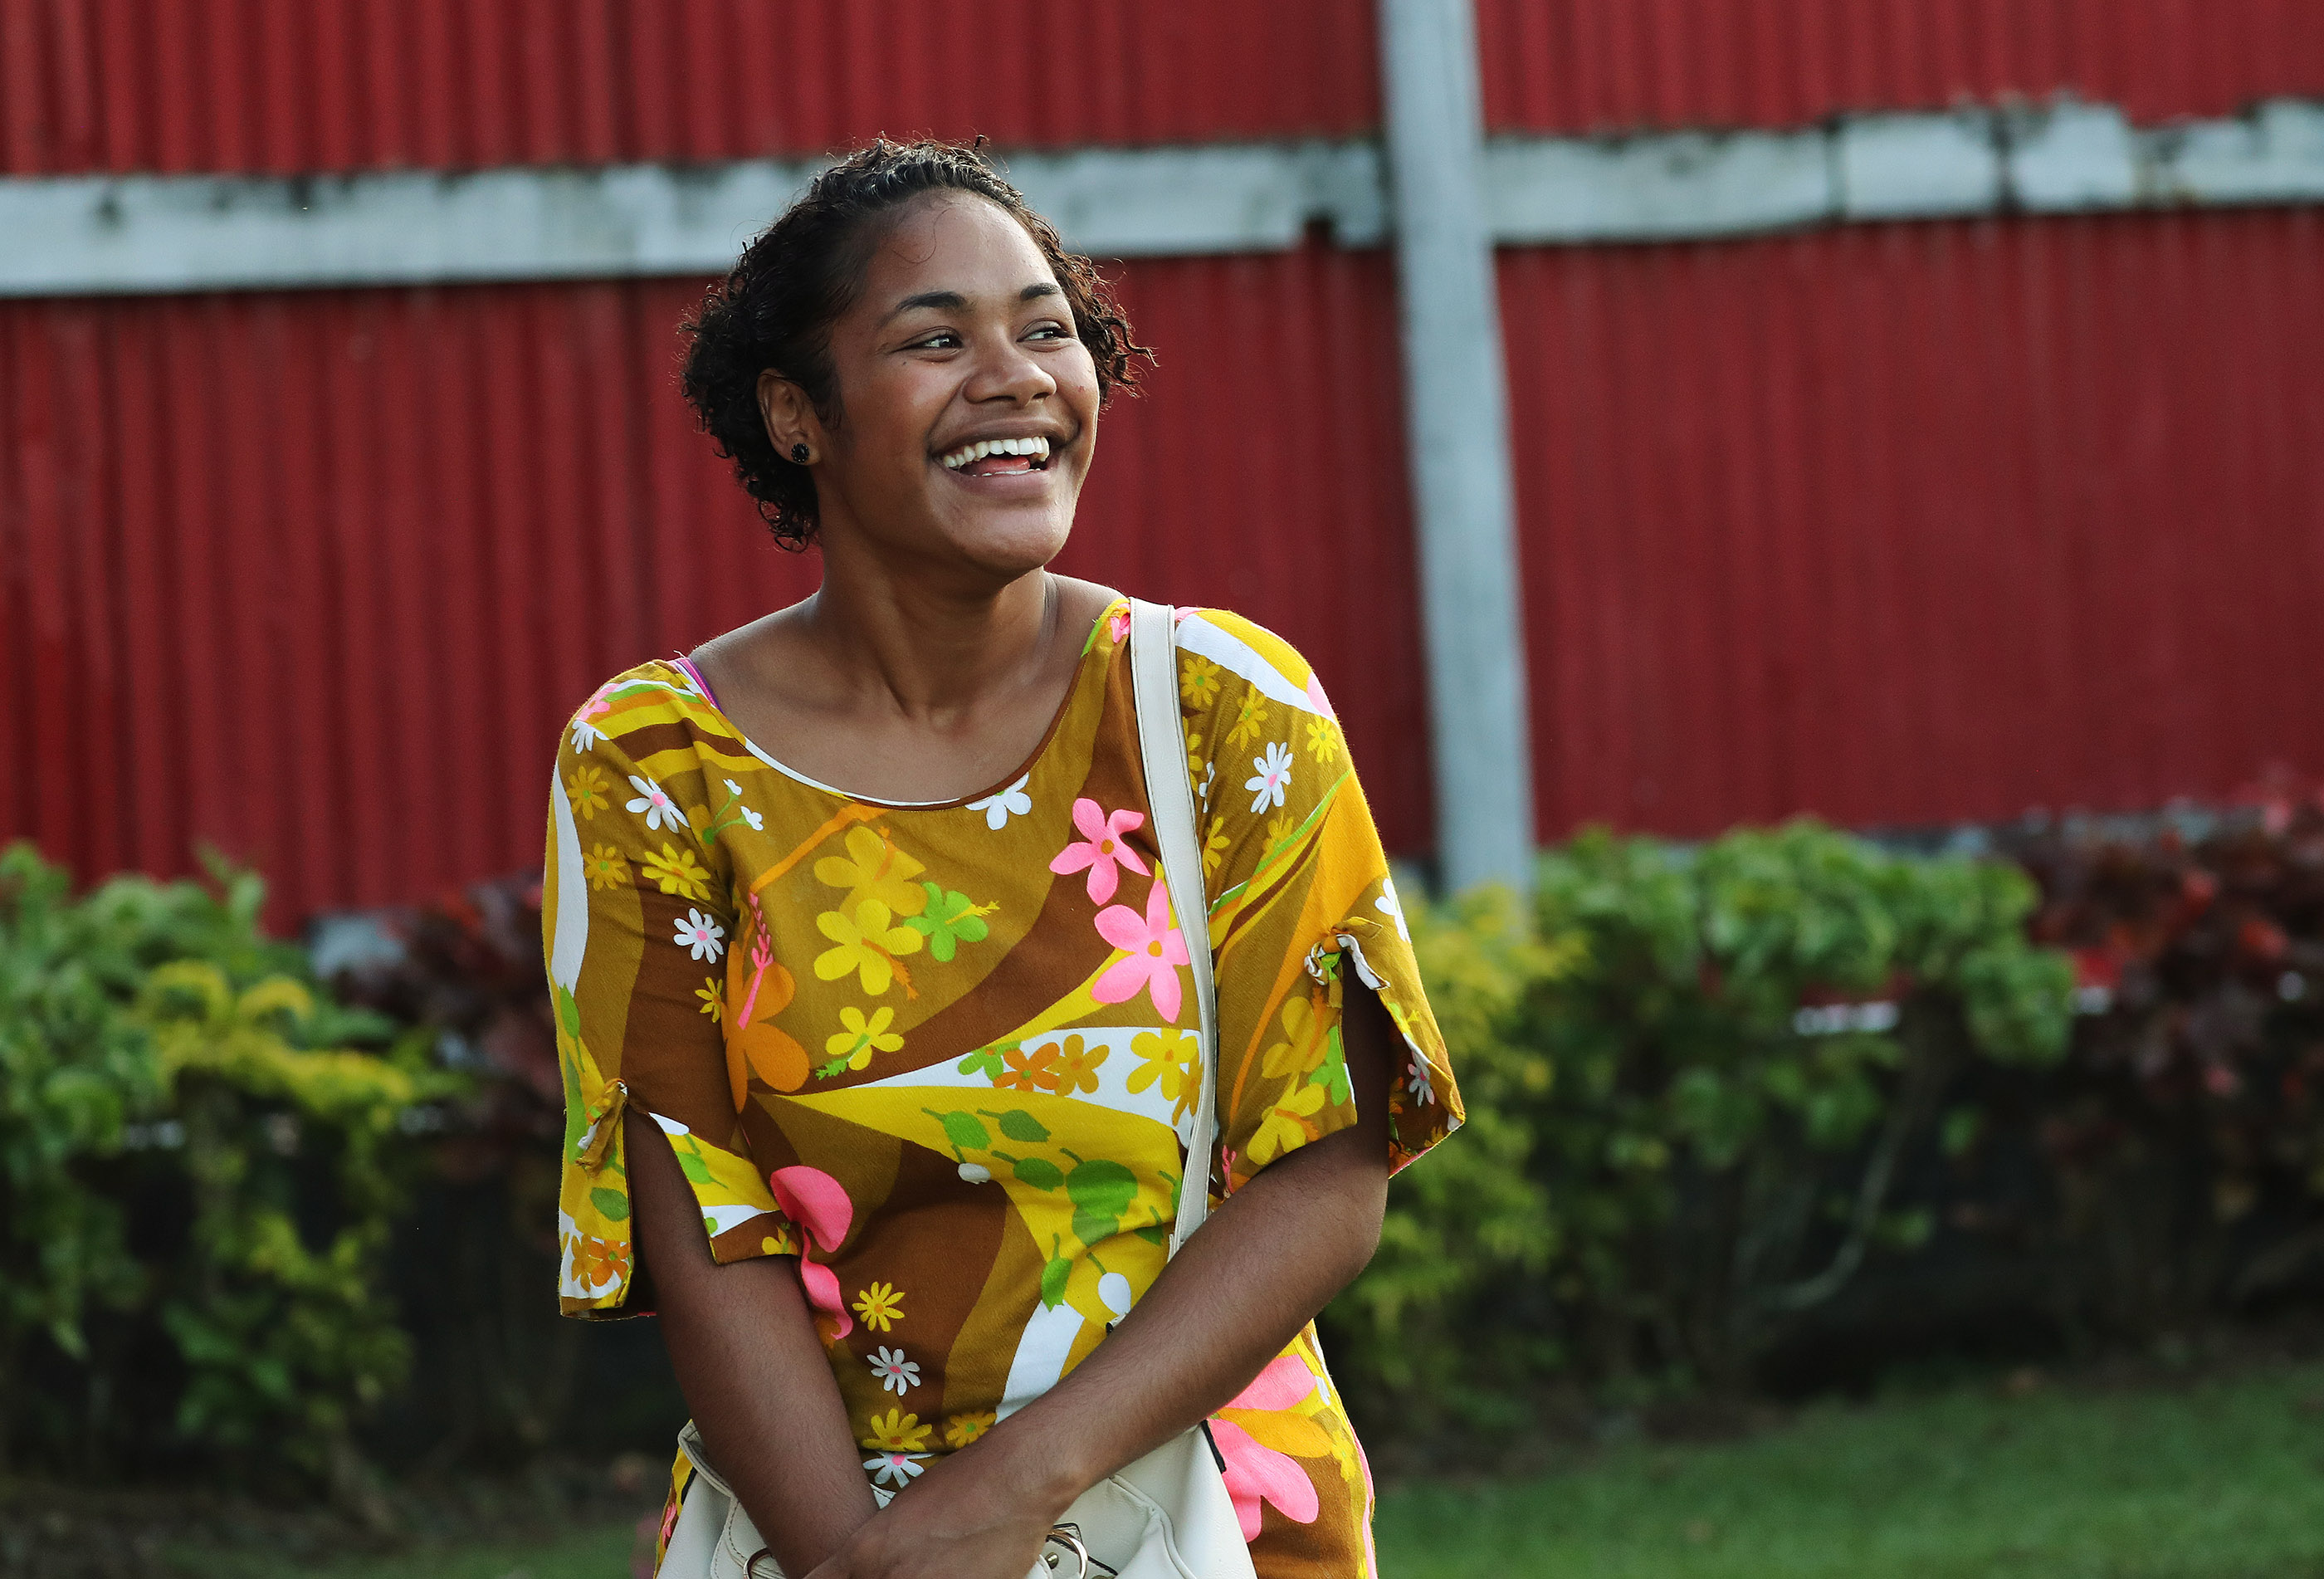 Mareca Tuibetua attends a devotional in Nausori, Fiji, on May 22, 2019.